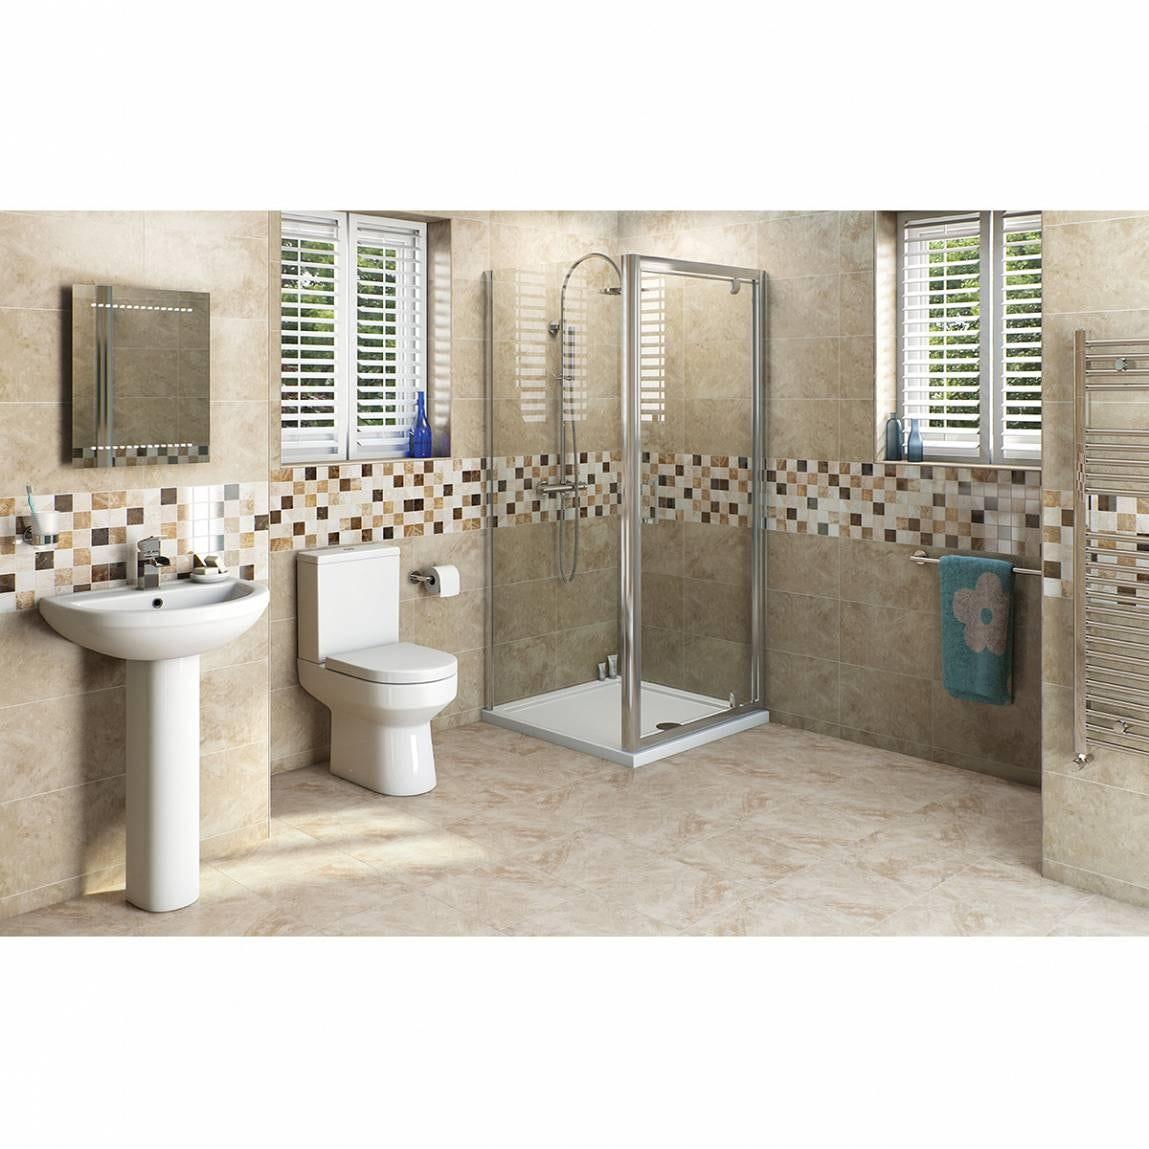 Oakley Bathroom set with 800 x 760 Pivot Enclosure & Tray